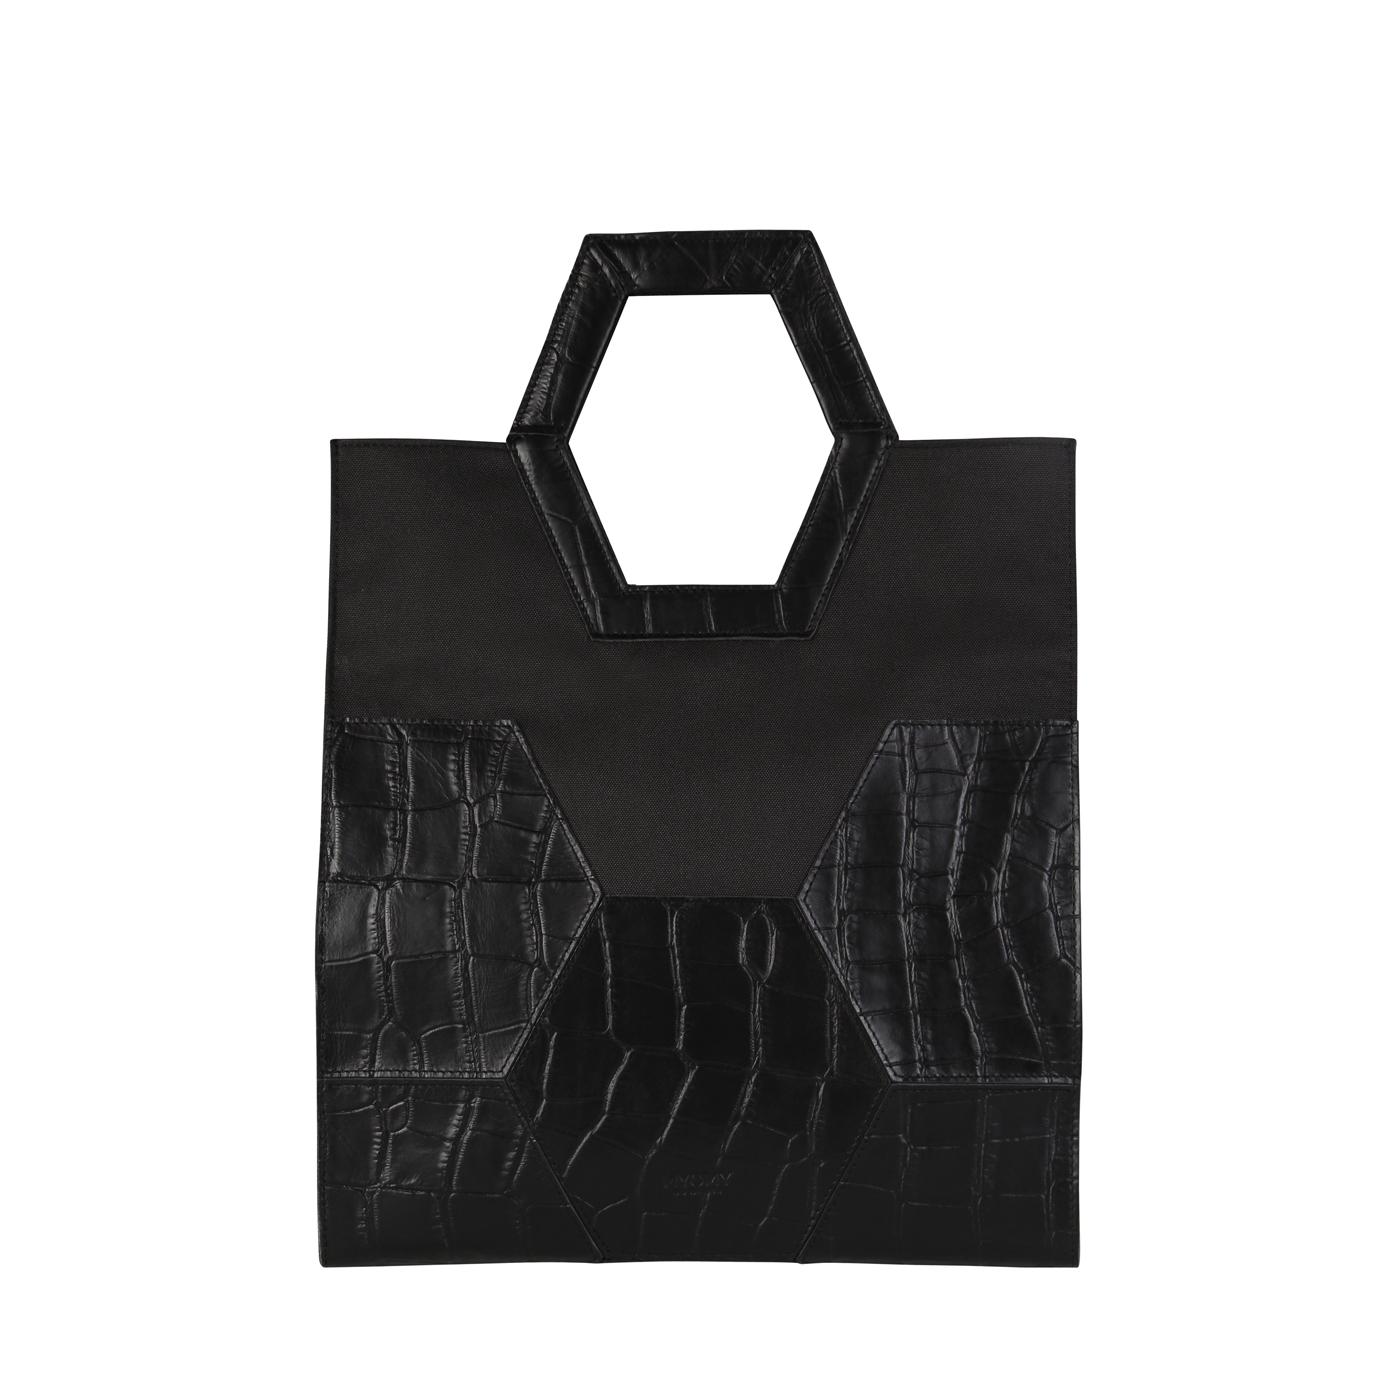 MY TREASURE BAG Shopper - croco black & recycled plastic